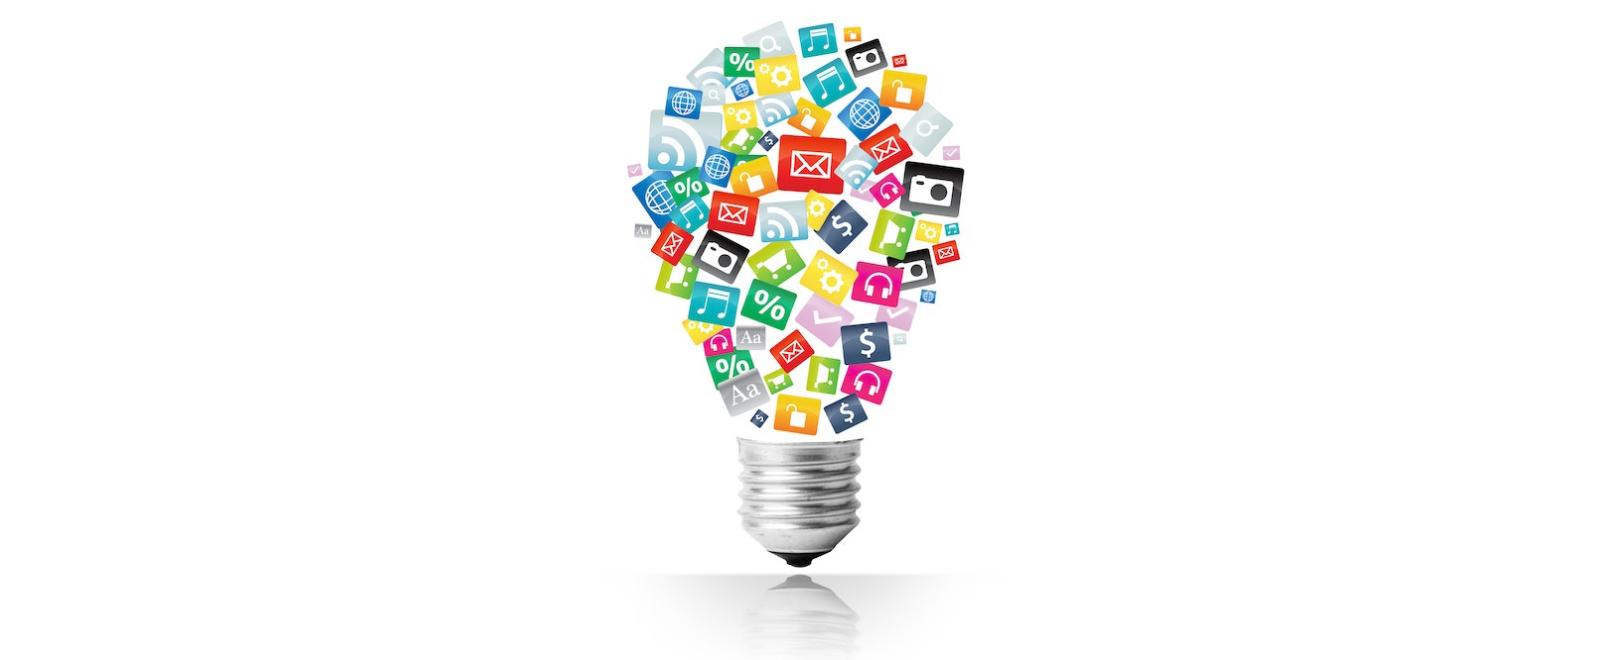 The FileMaker Platform: Integration Inspires Innovation